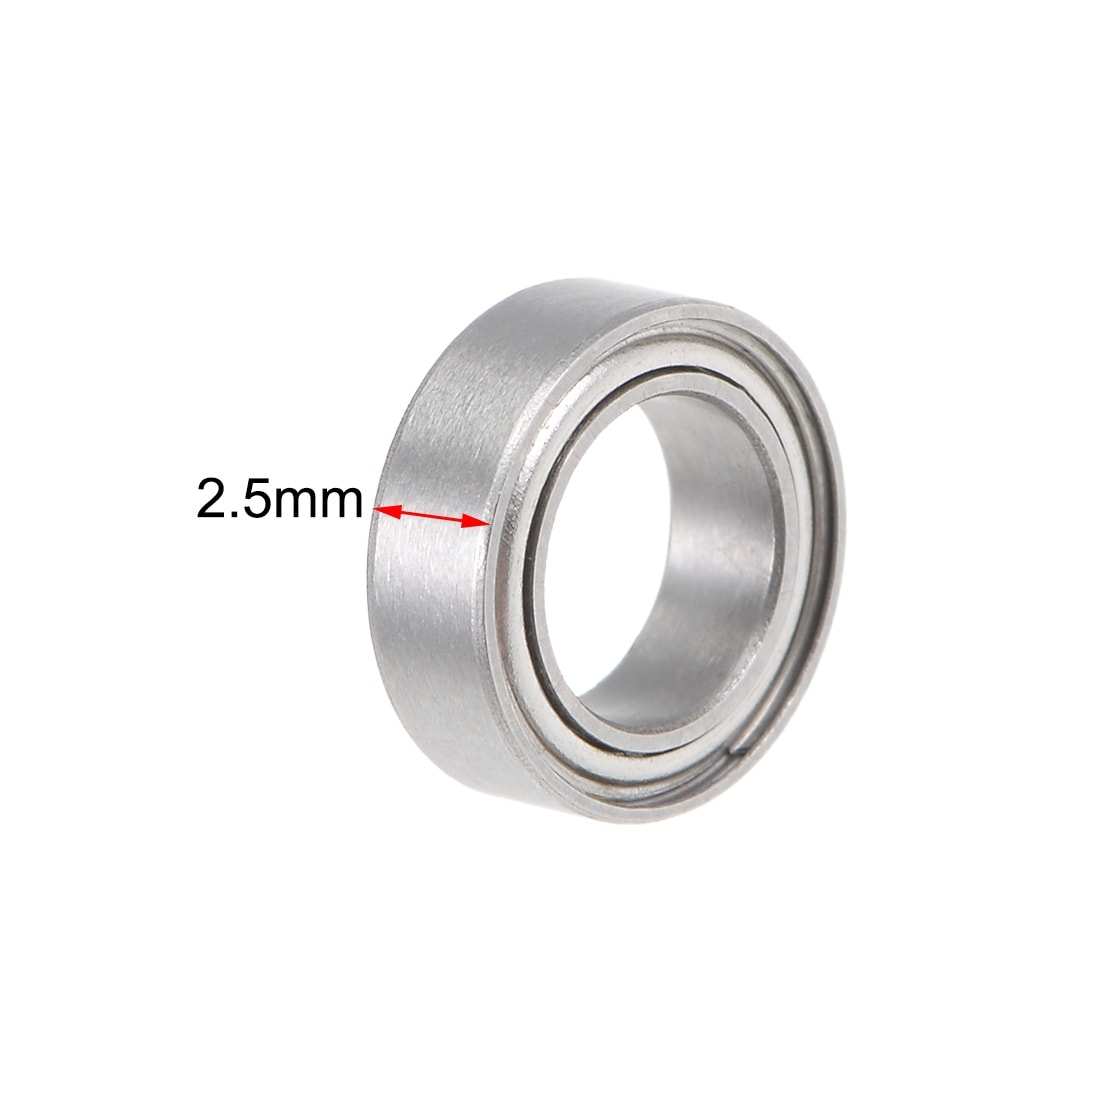 3x6x2.5 mm 5 PCS MF63zz Flange Metal Double Shielded Ball Bearing Bearings